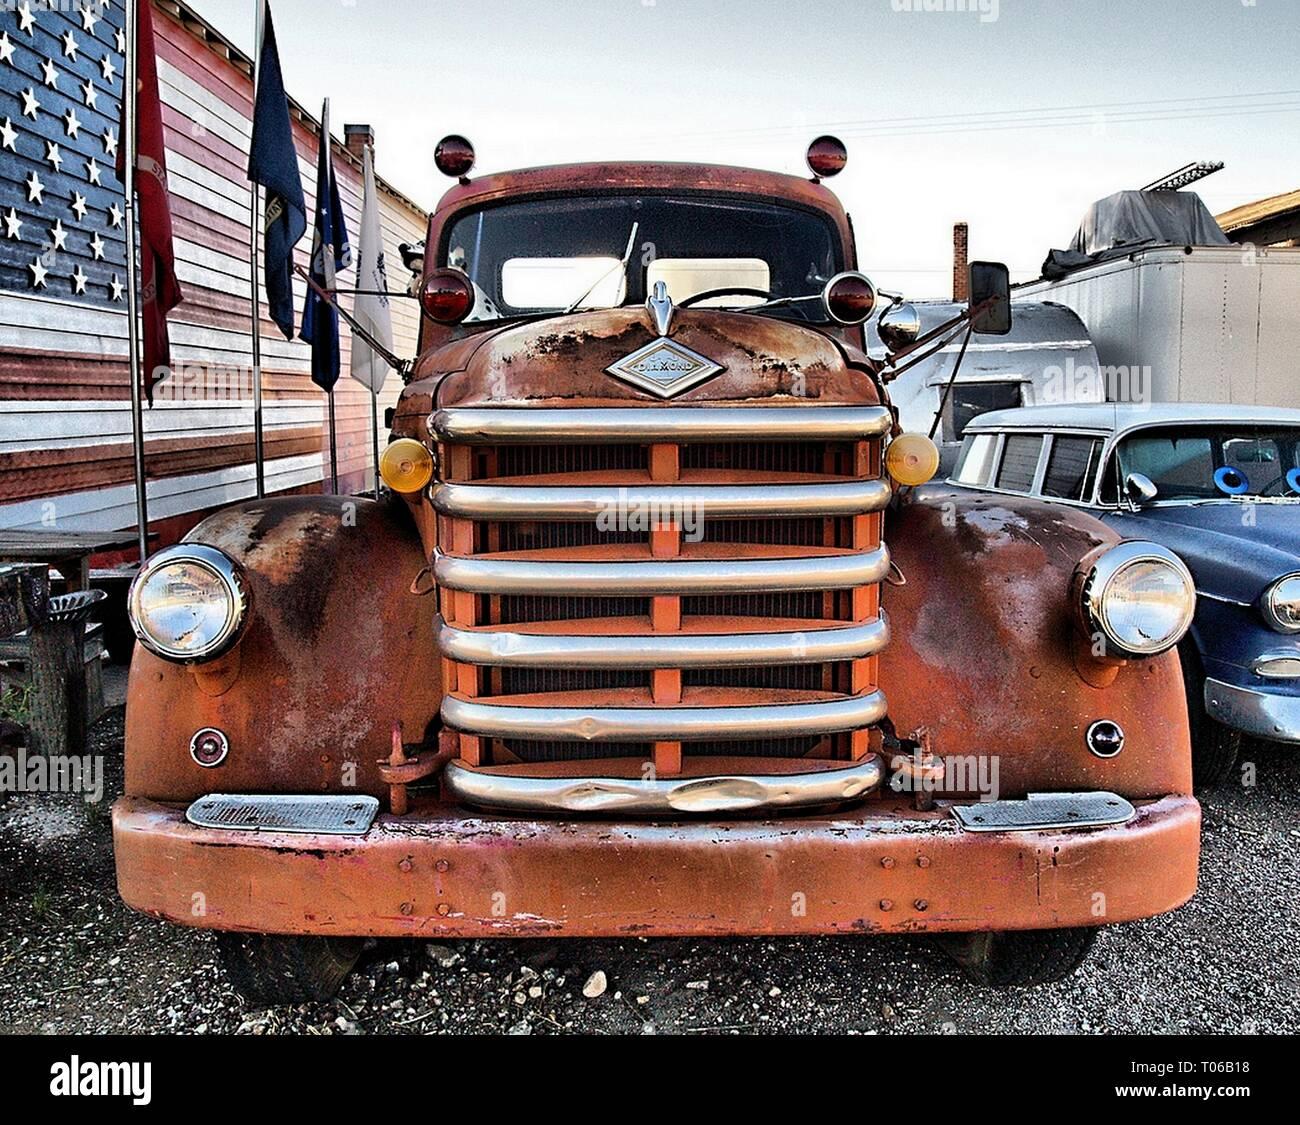 Route 66 automobiles Photo Stock